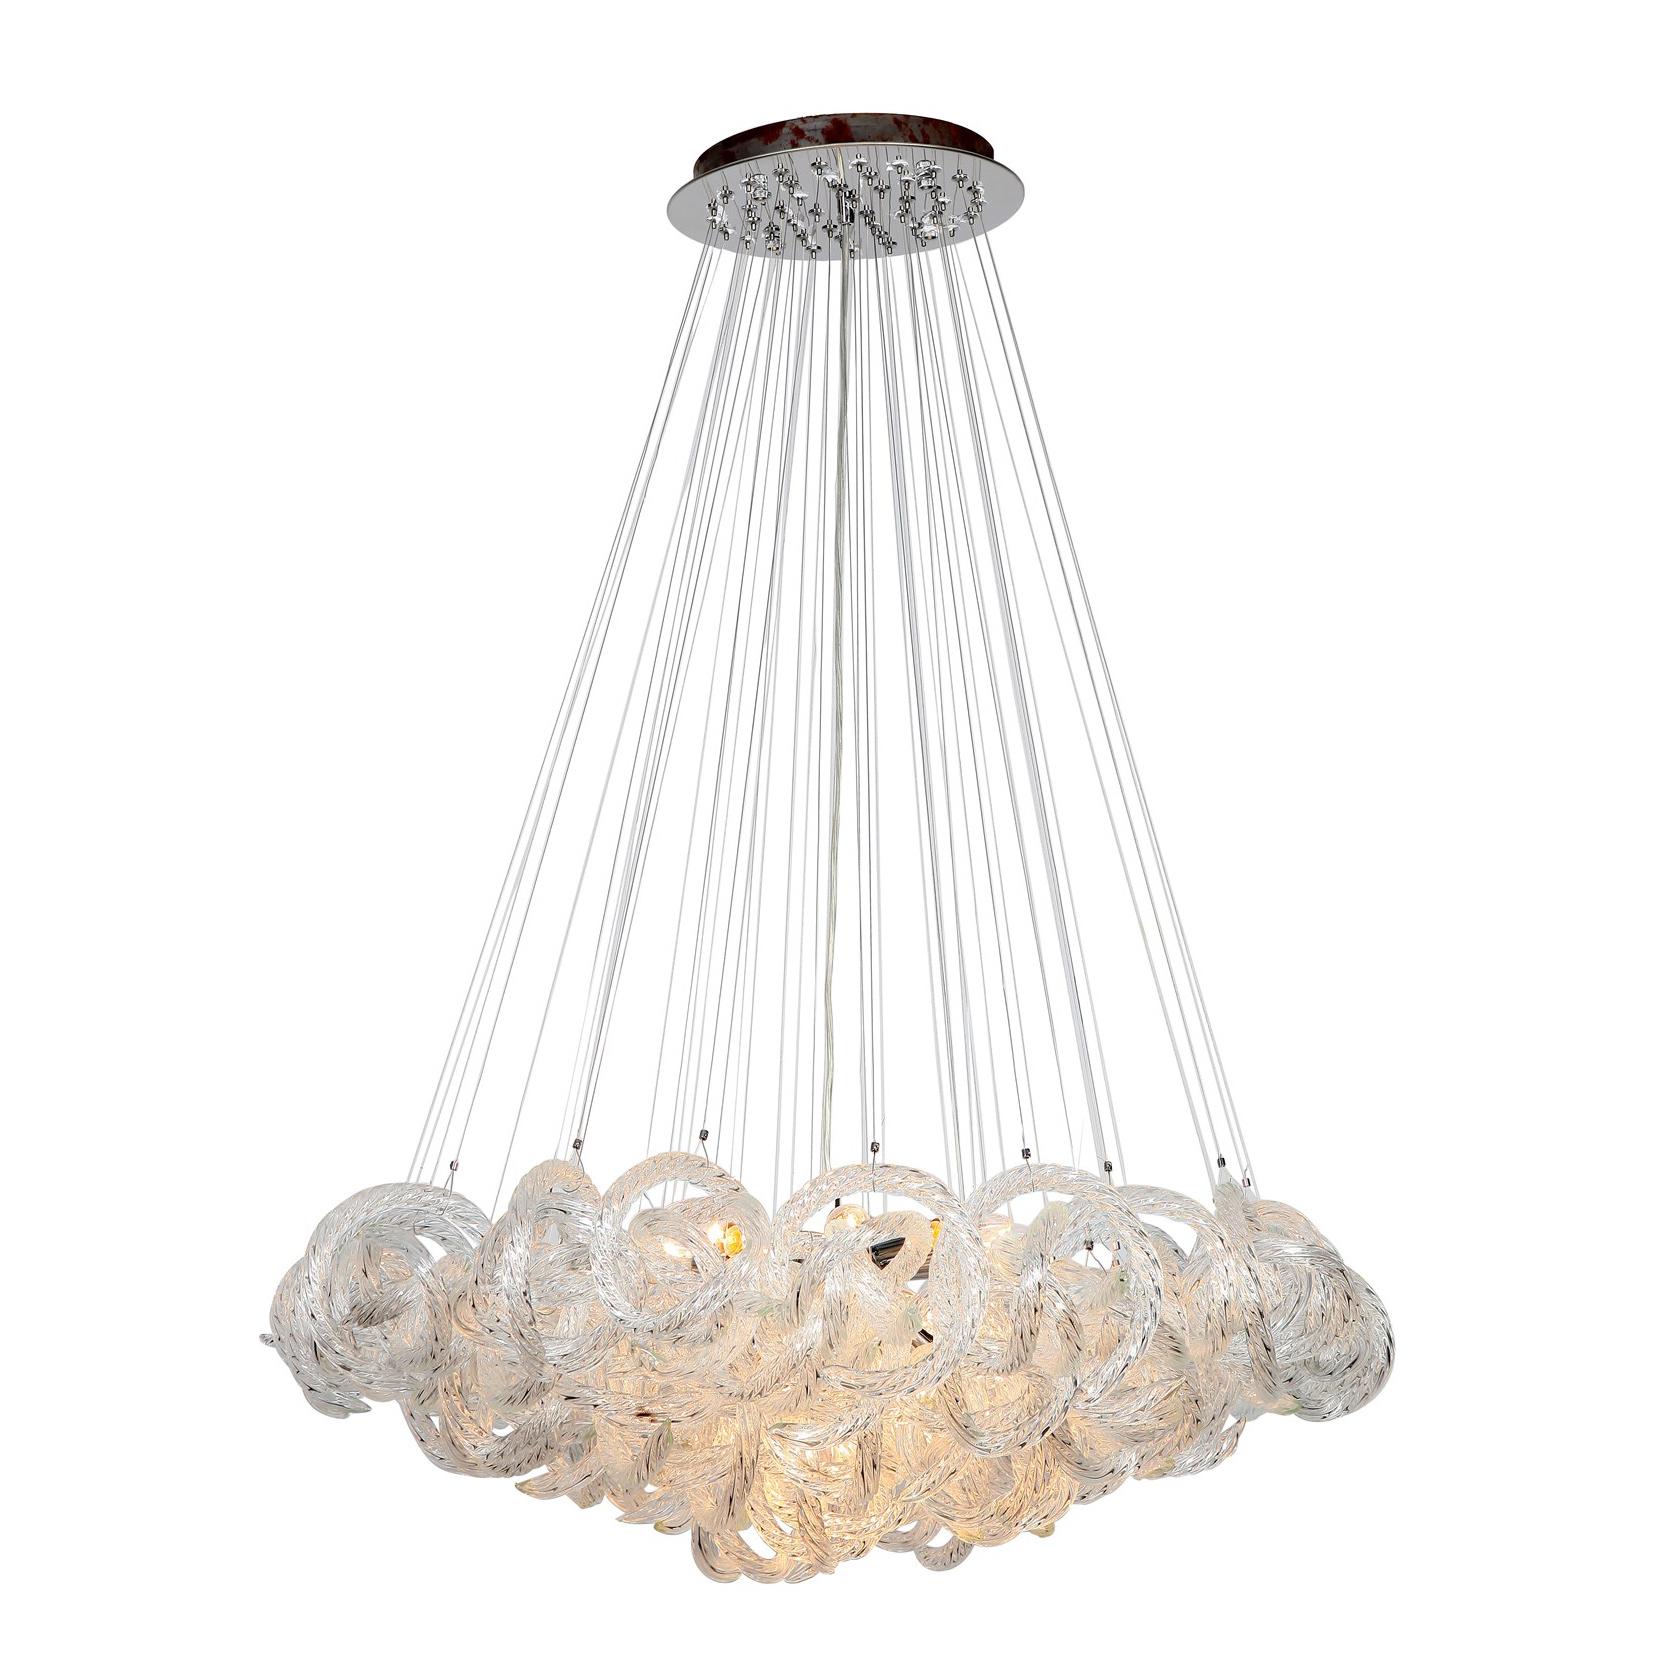 Chandelier by viz glass ch 2416 5c infinity chandelier by viz glass ch 2416 5c arubaitofo Images